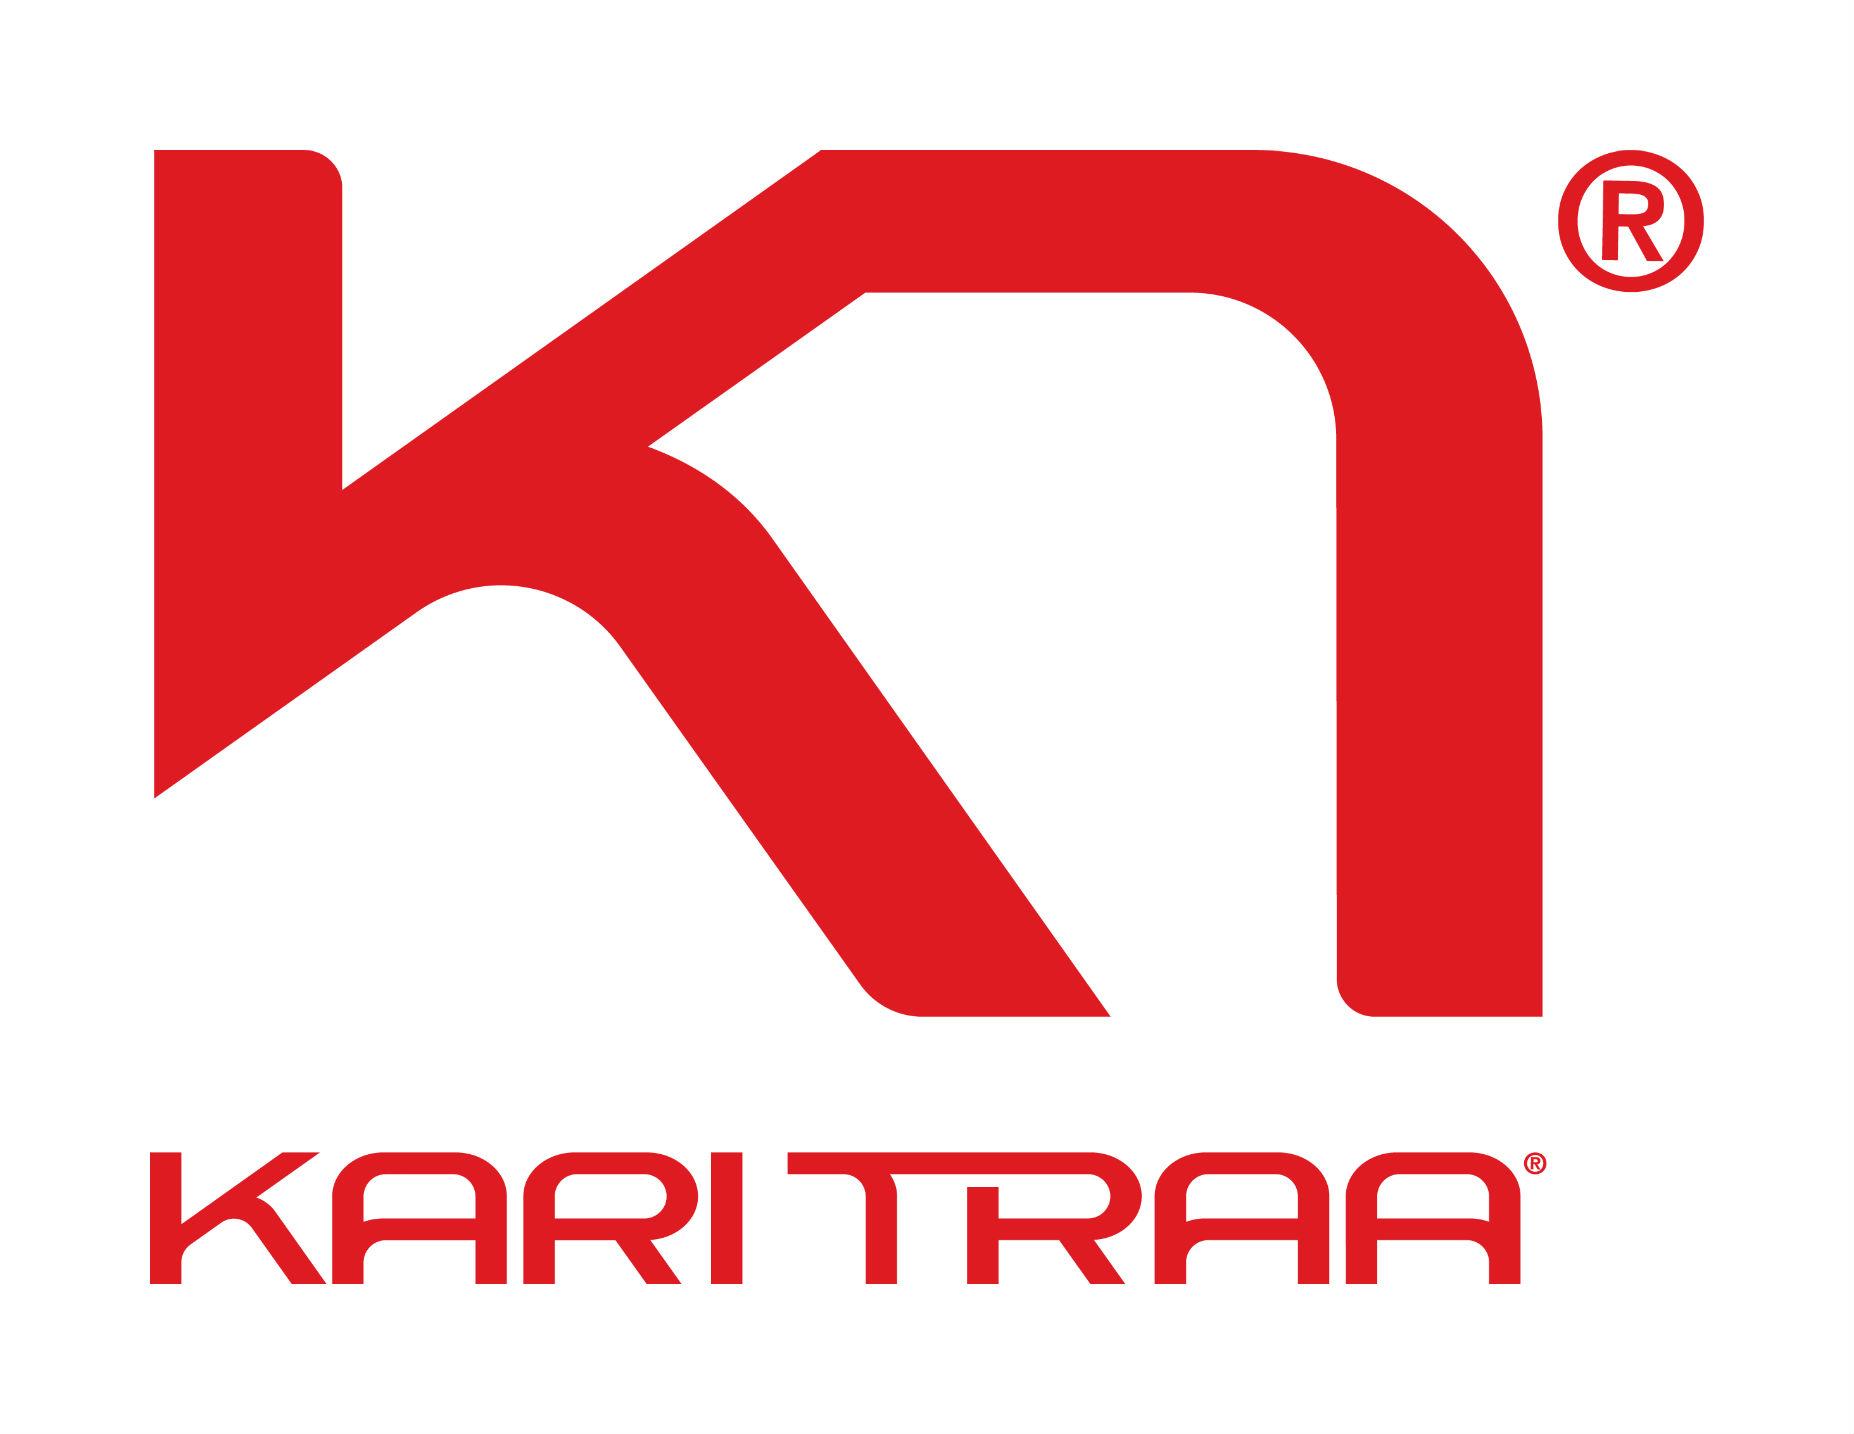 karitraa_logo_2016_WRED